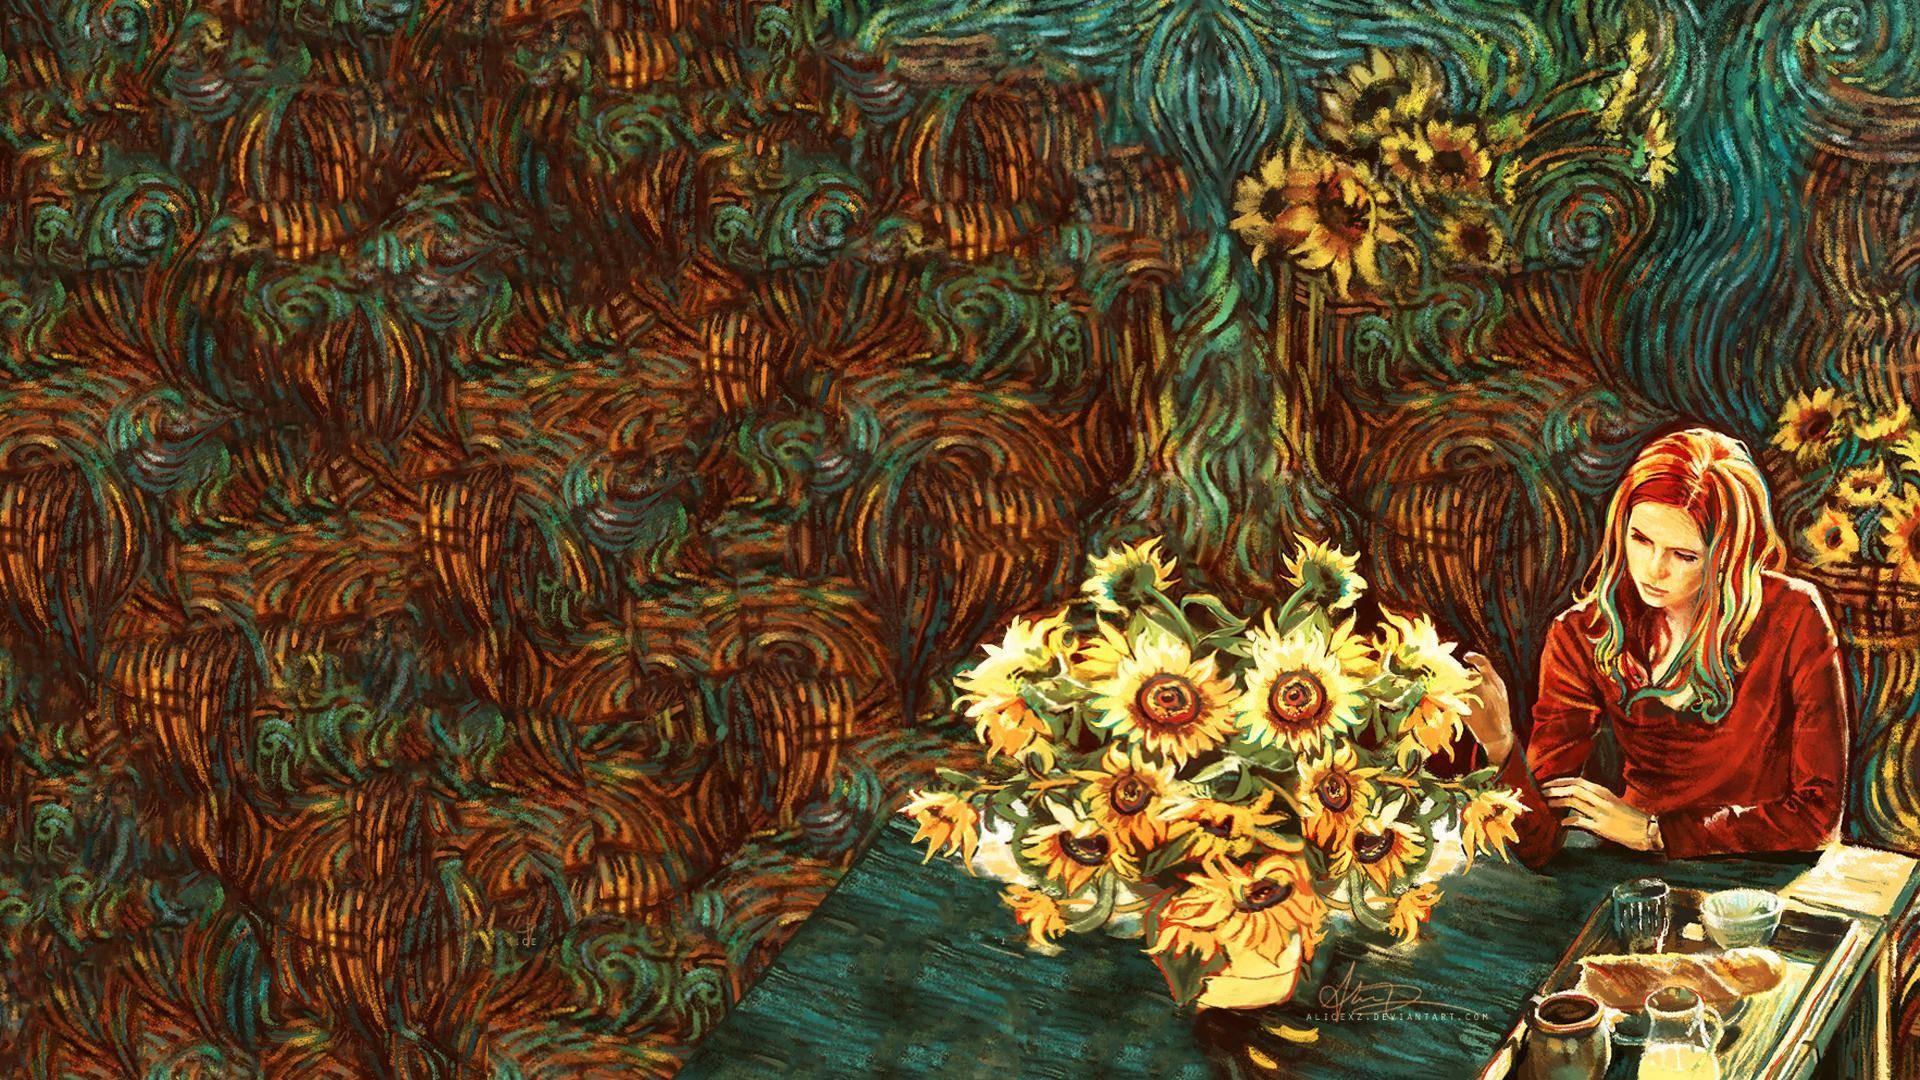 Explore Van Gogh Sunflowers, Wallpaper Art, and more!